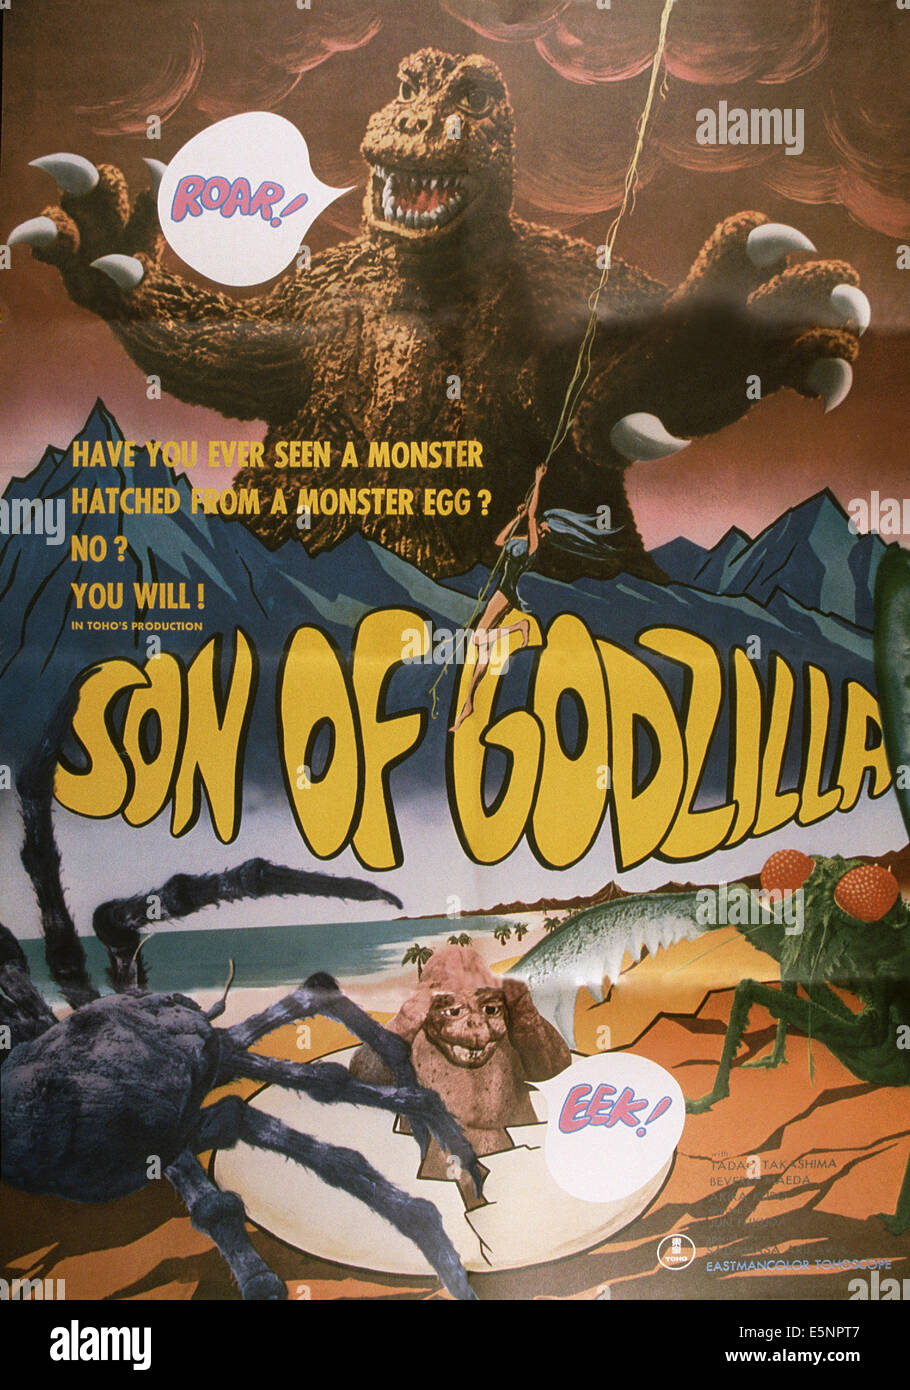 SON OF GODZILLA, (aka KAIJUTO NO KESSEN: GOJIRA NO), US poster, 1967 - Stock Image